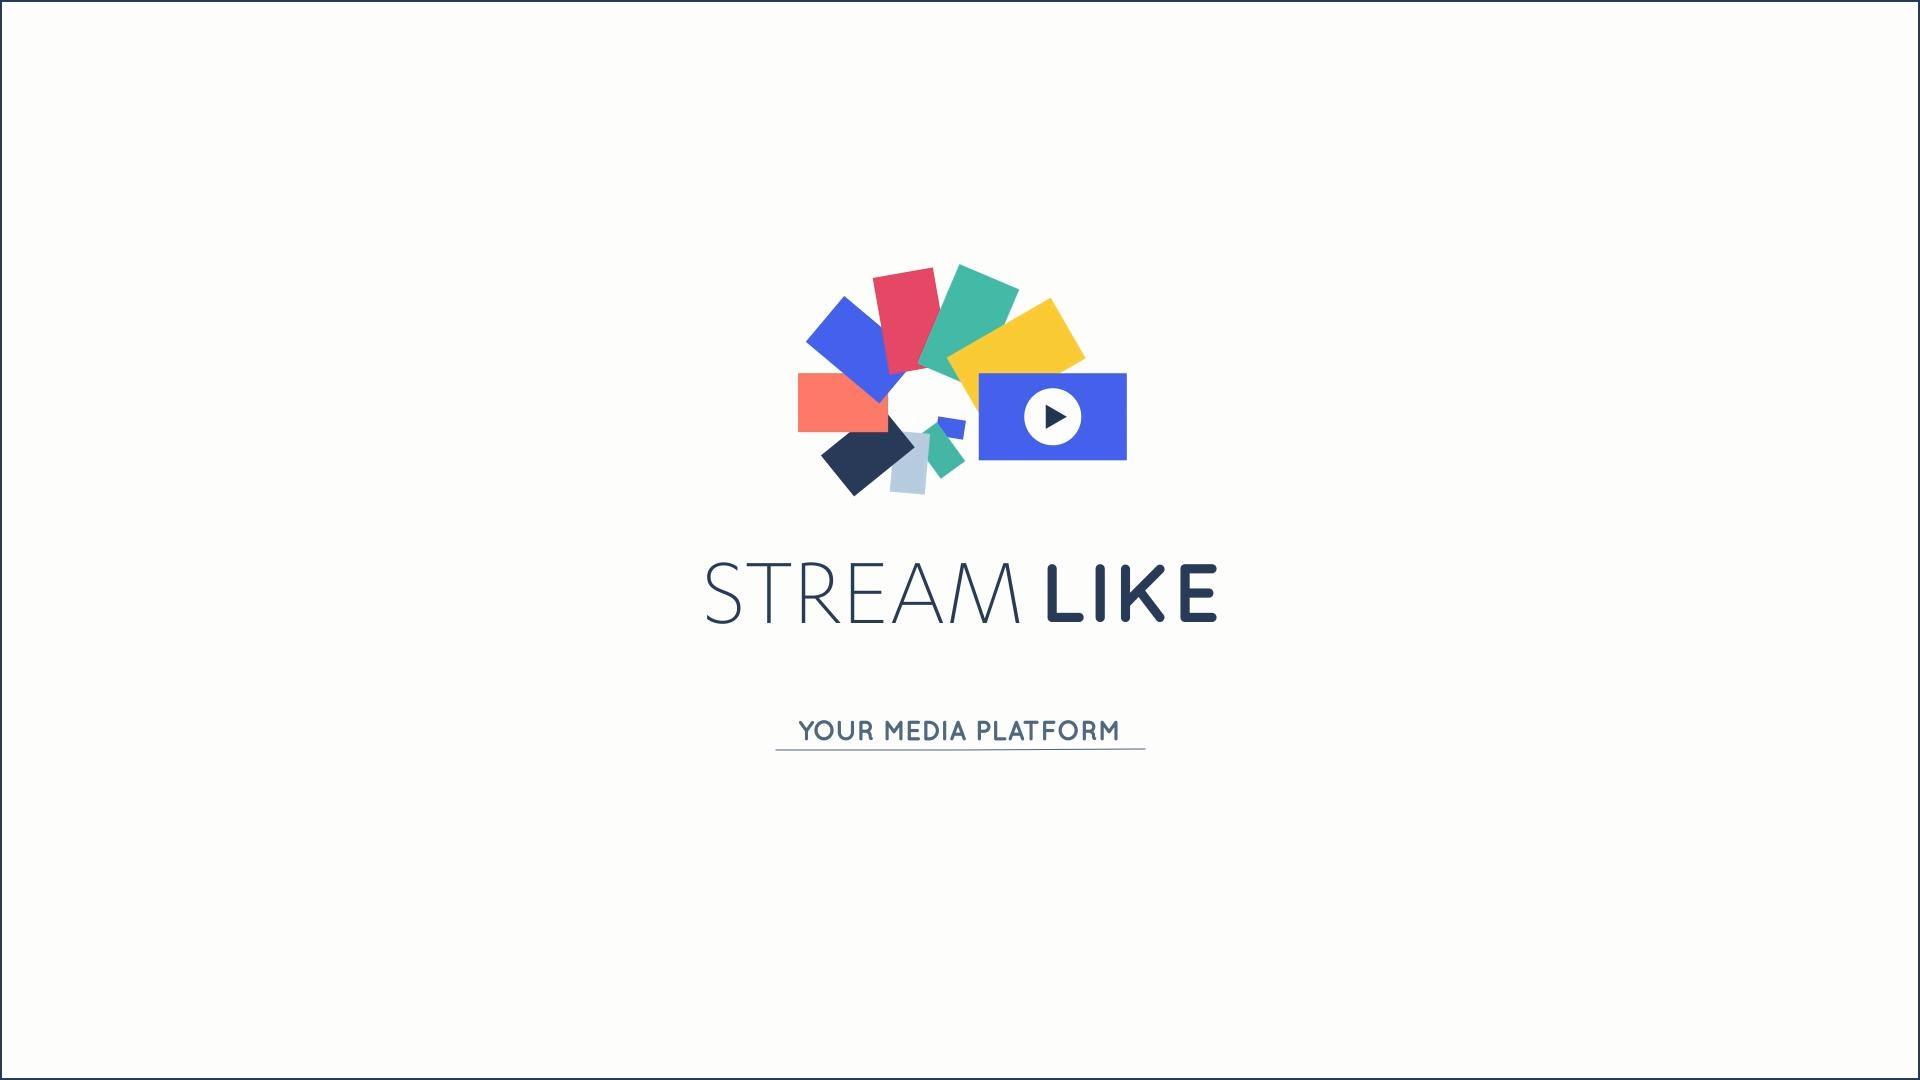 Streamlike, your Media Platform